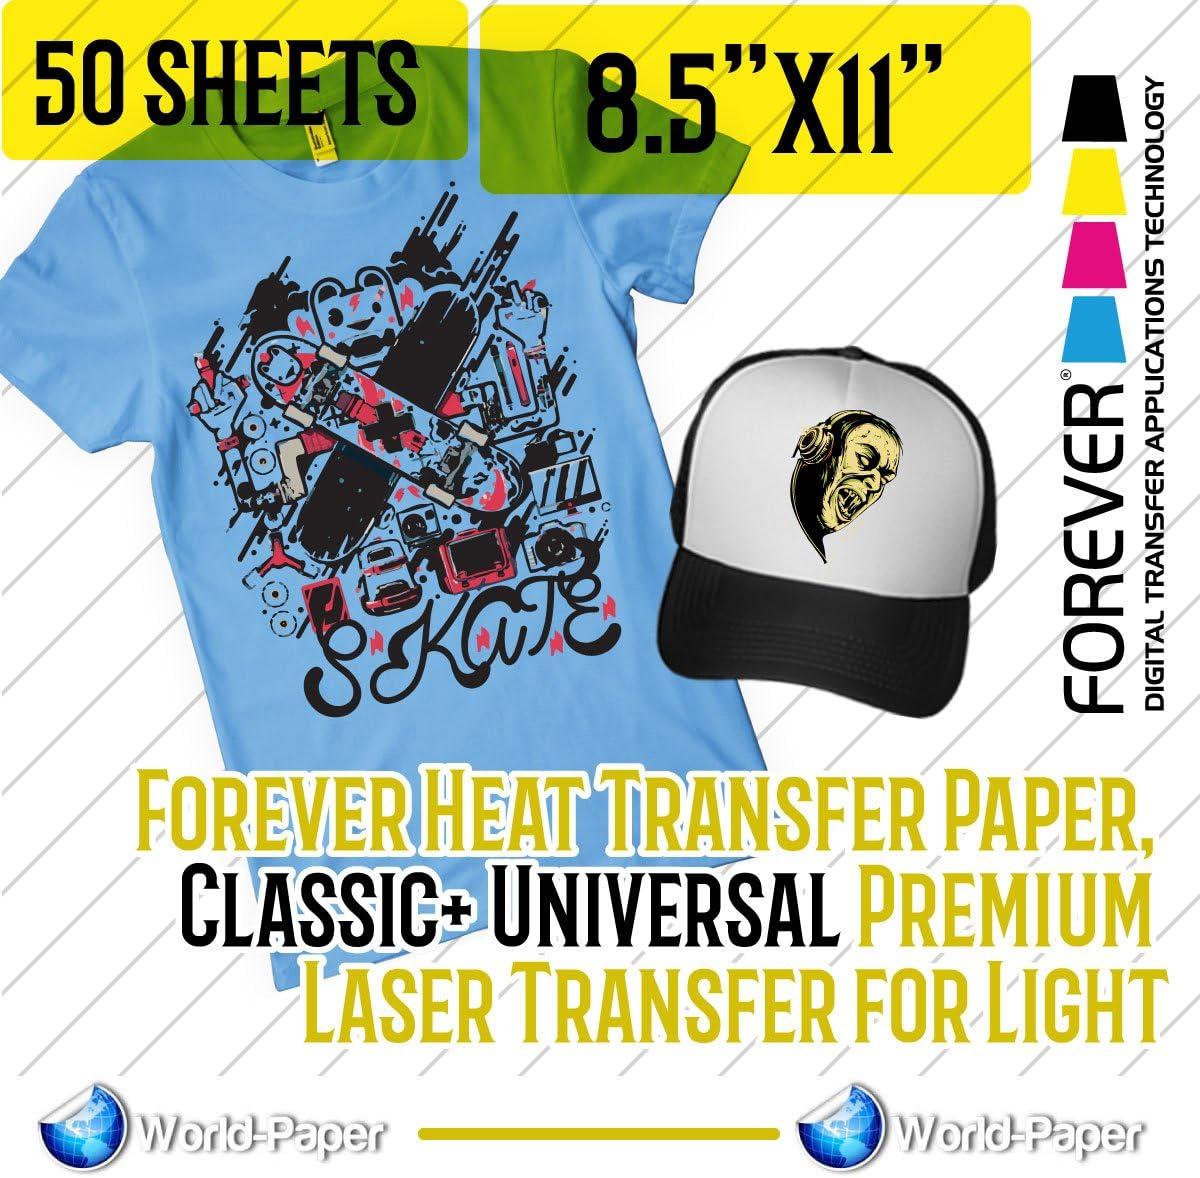 Forever Heat Transfer Paper Universal Premium Laser Transfer for Light 50 Sheets 8.5x11 Classic